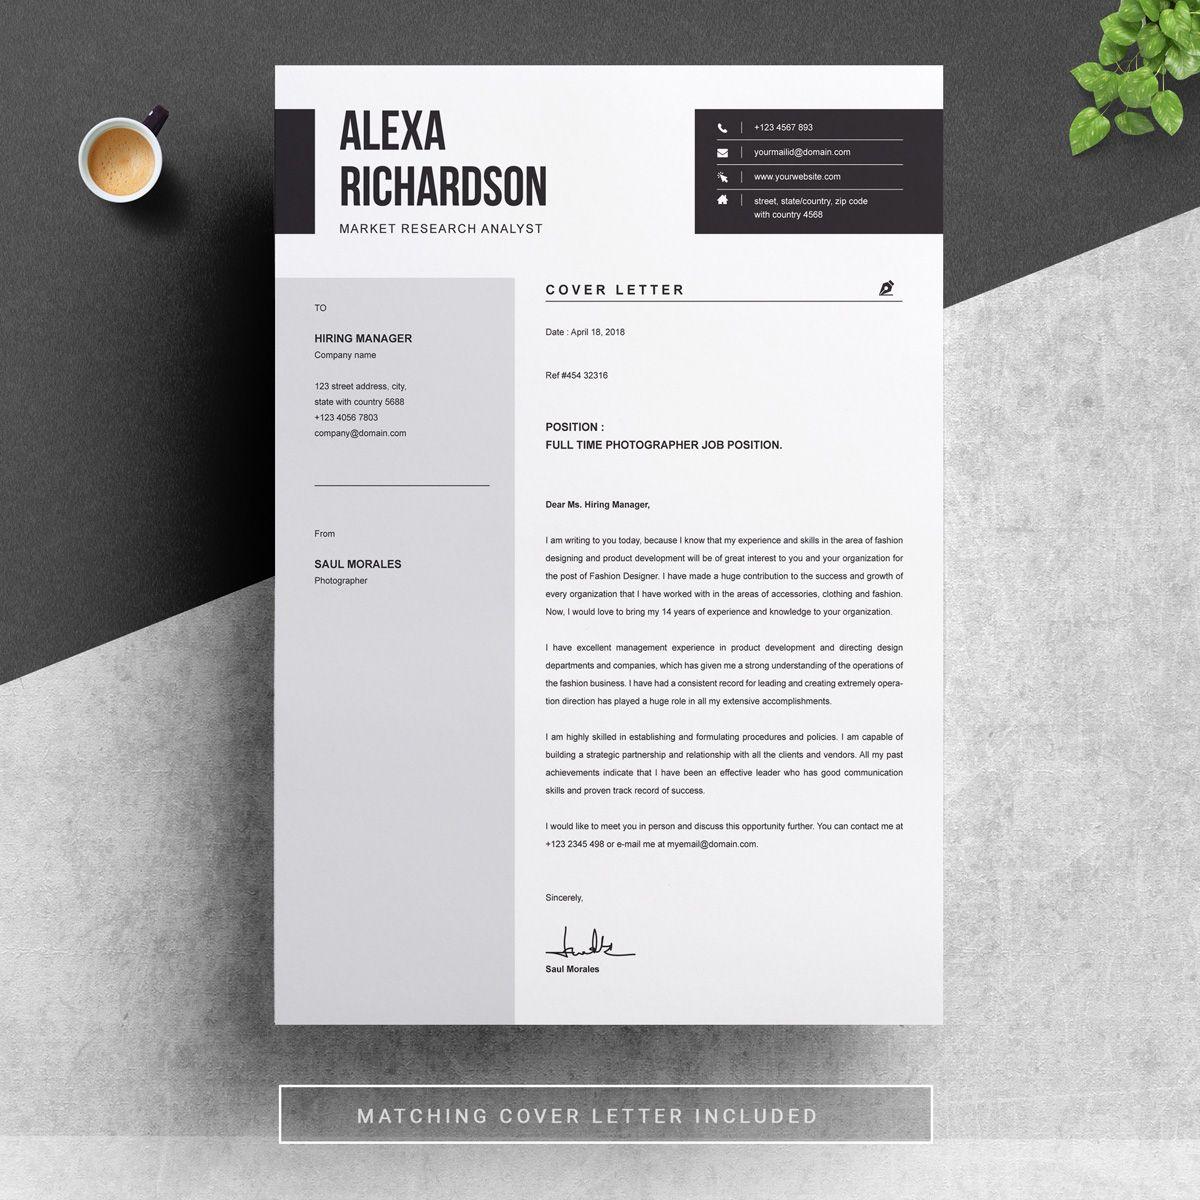 Alexa resume template 83022 cv template resume design